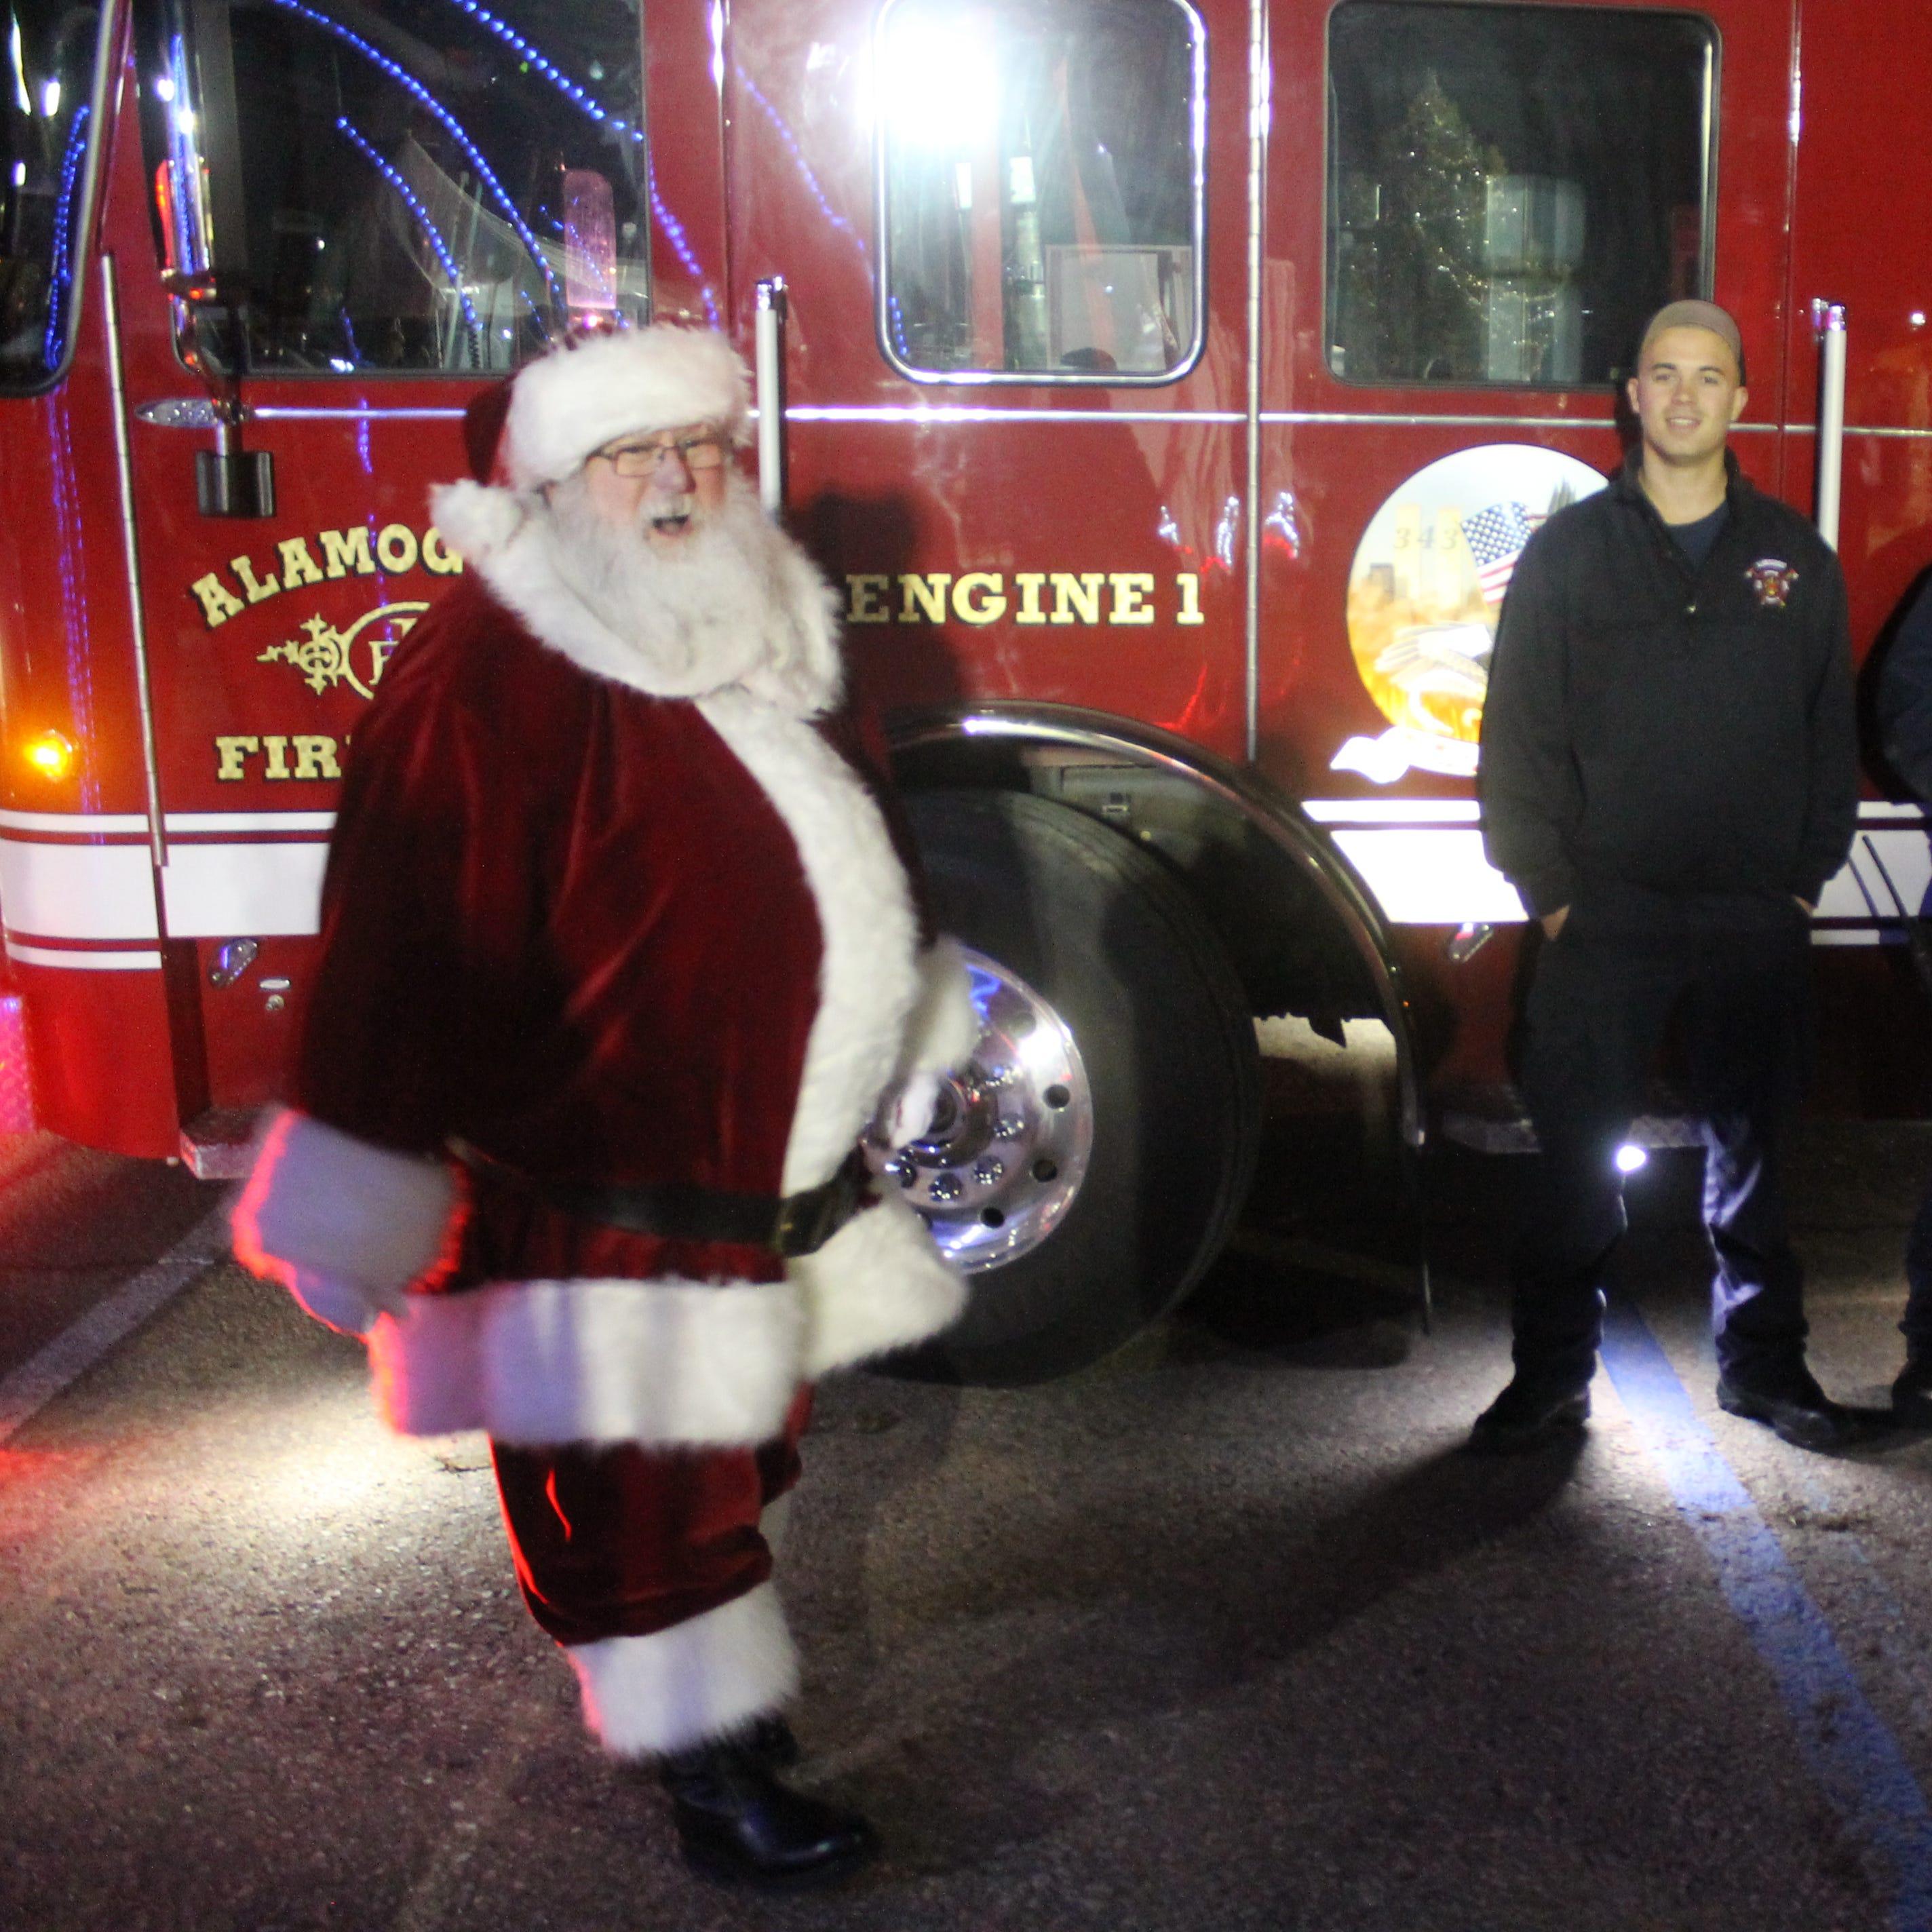 Alamogordo celebrates Christmas with tree lighting ceremony